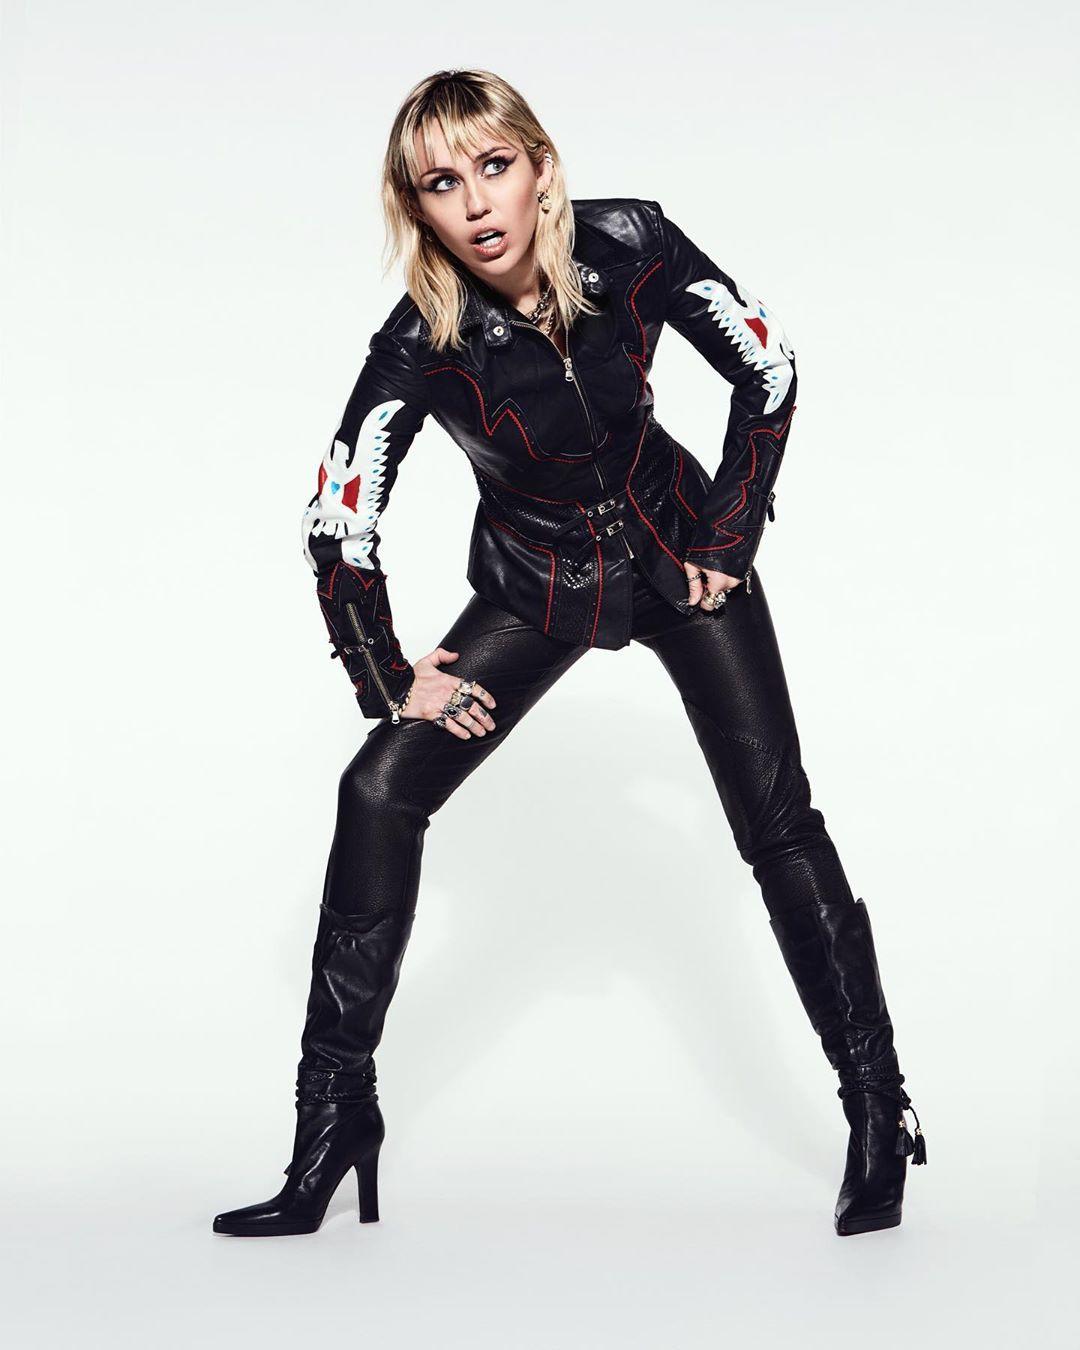 mileycyrus latex clothing, leggings, leather matching dress